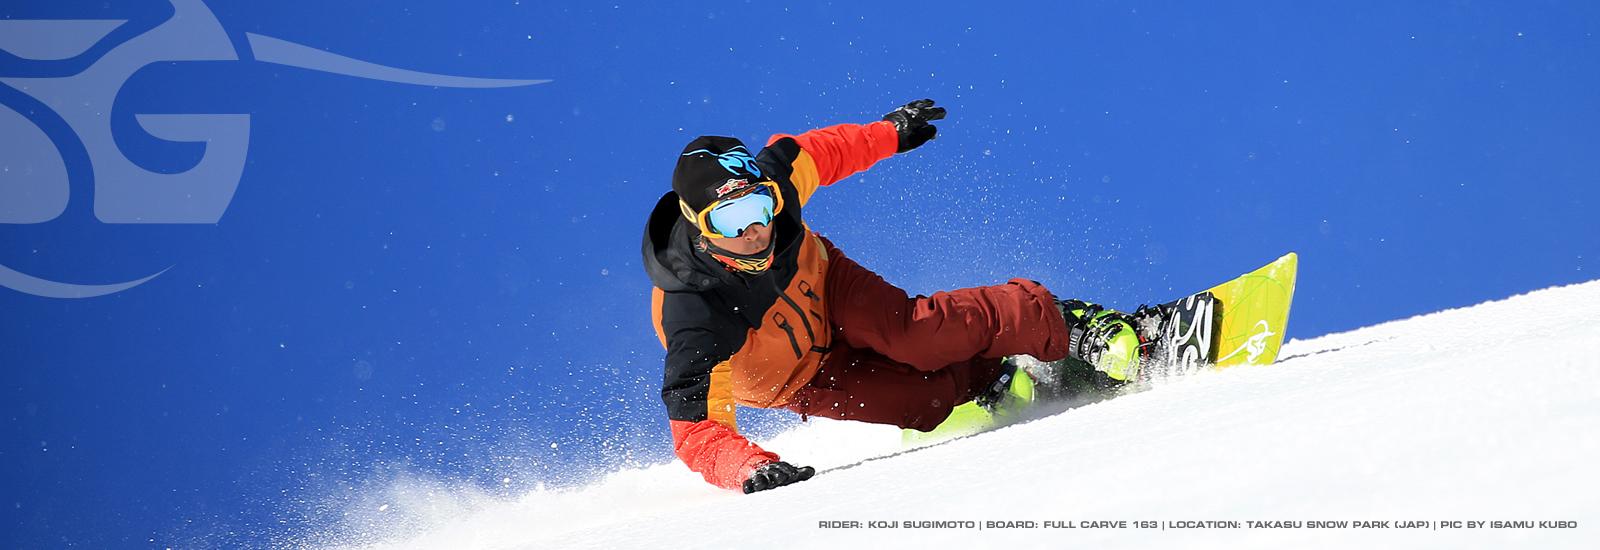 SG SNOWBOARDS Koji Sugimoto FULL CARVE 163 16-17 Takasu Snow Park Japan by Isamu Kubo